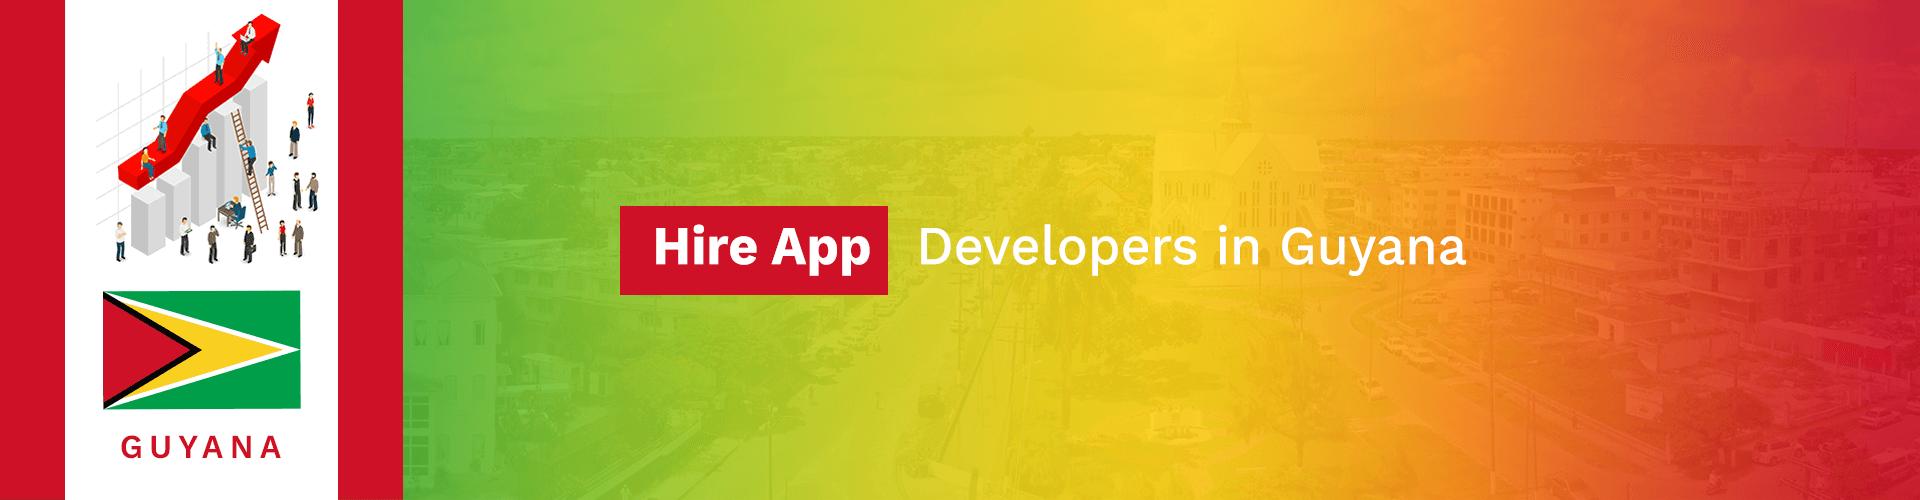 mobile app development guyana